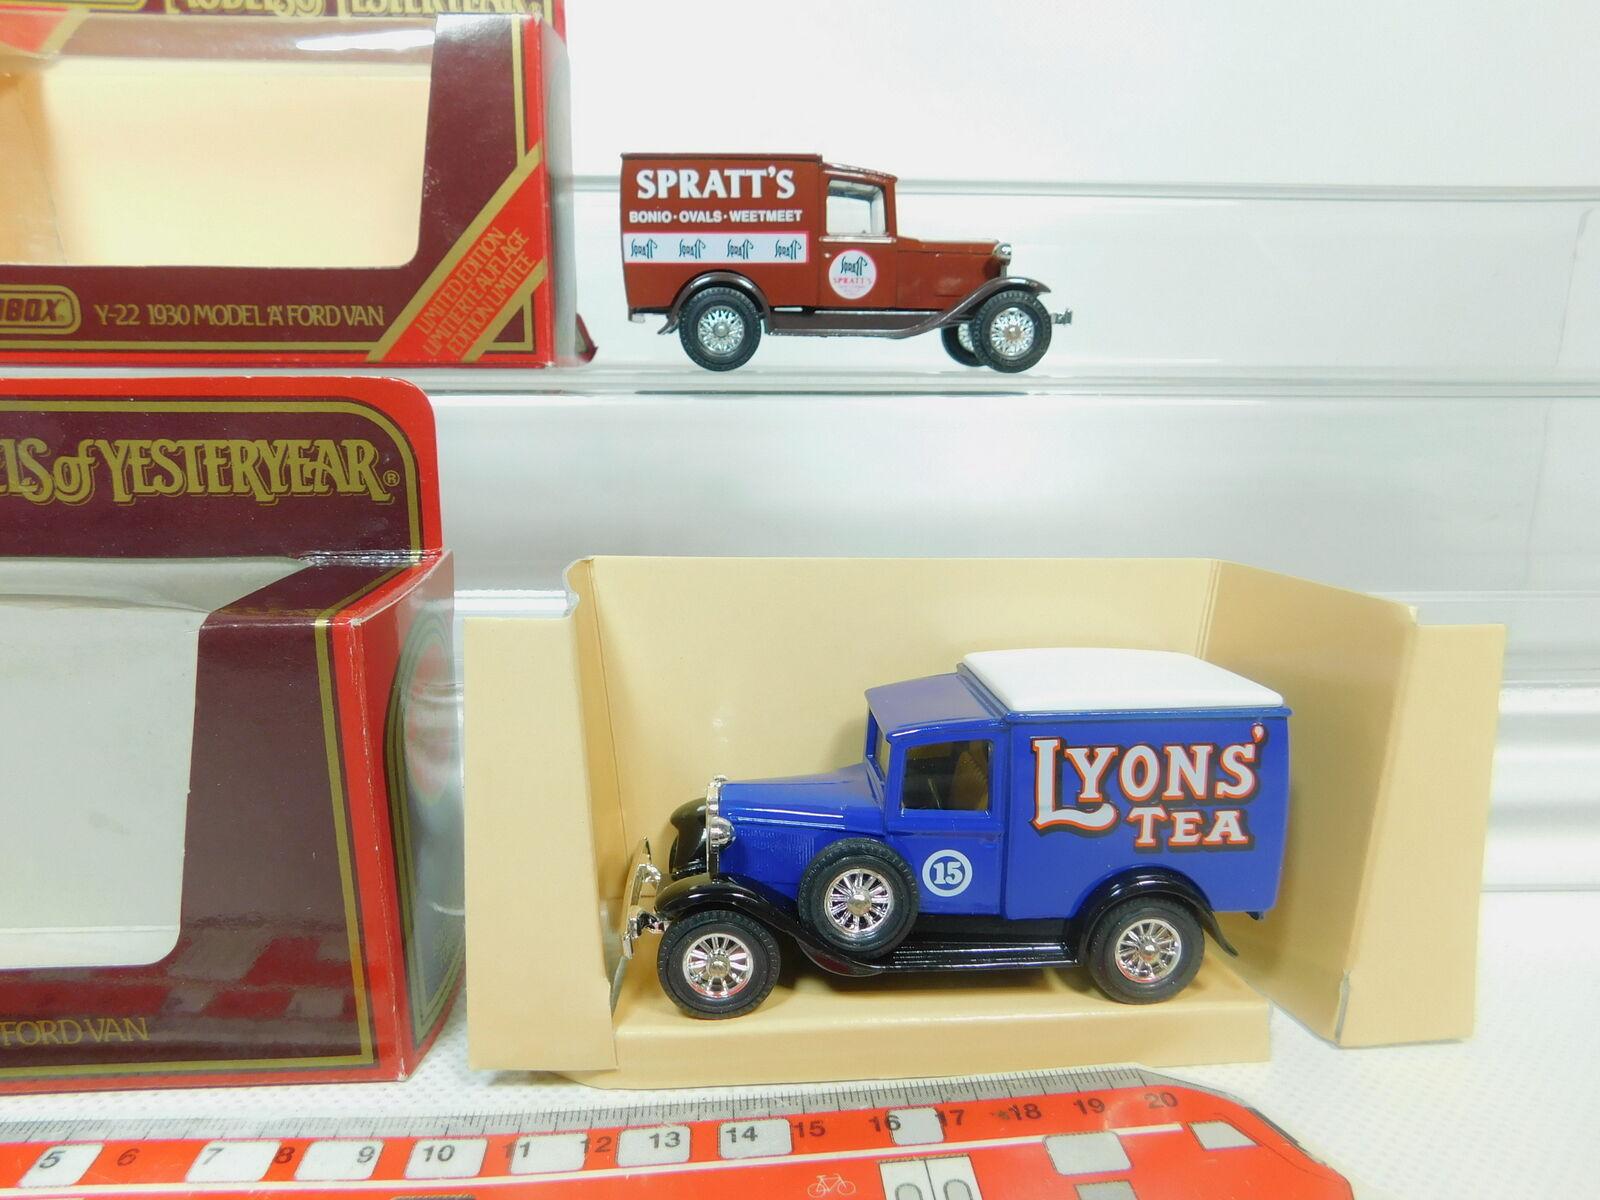 BO966-1  2x Matchbox Y-22 Furgoneta Ford Ford Ford Modelo a   Spratt's + Lyons ' Tea,S. G 5d0245